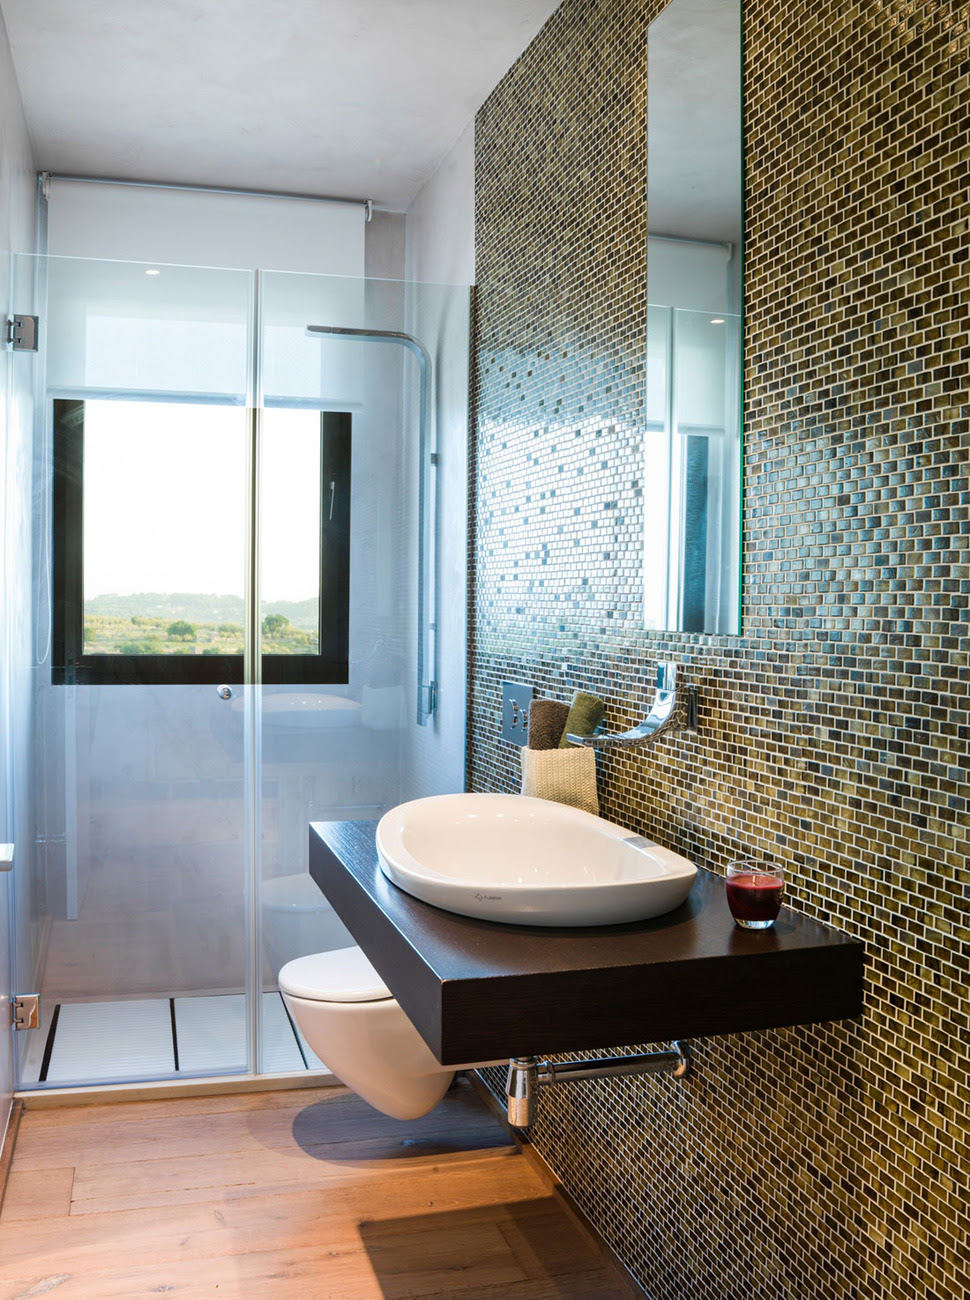 Concrete Home Combines Earth Tones with Minimalist ...